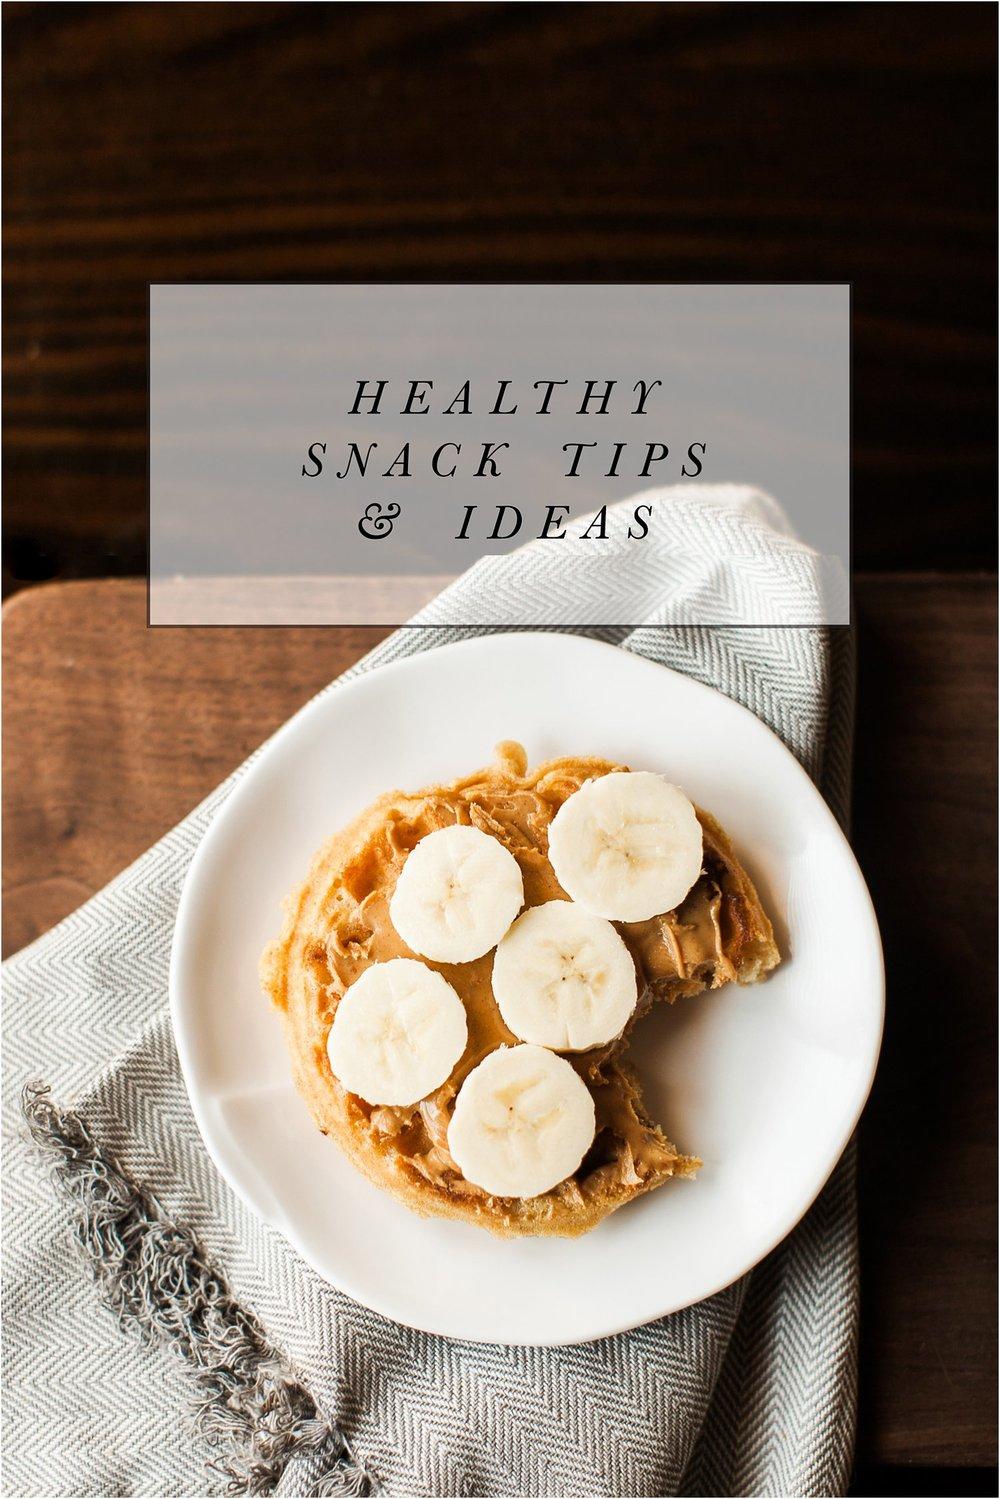 Healthy Snack Tips & Ideas | Feast & Dwell